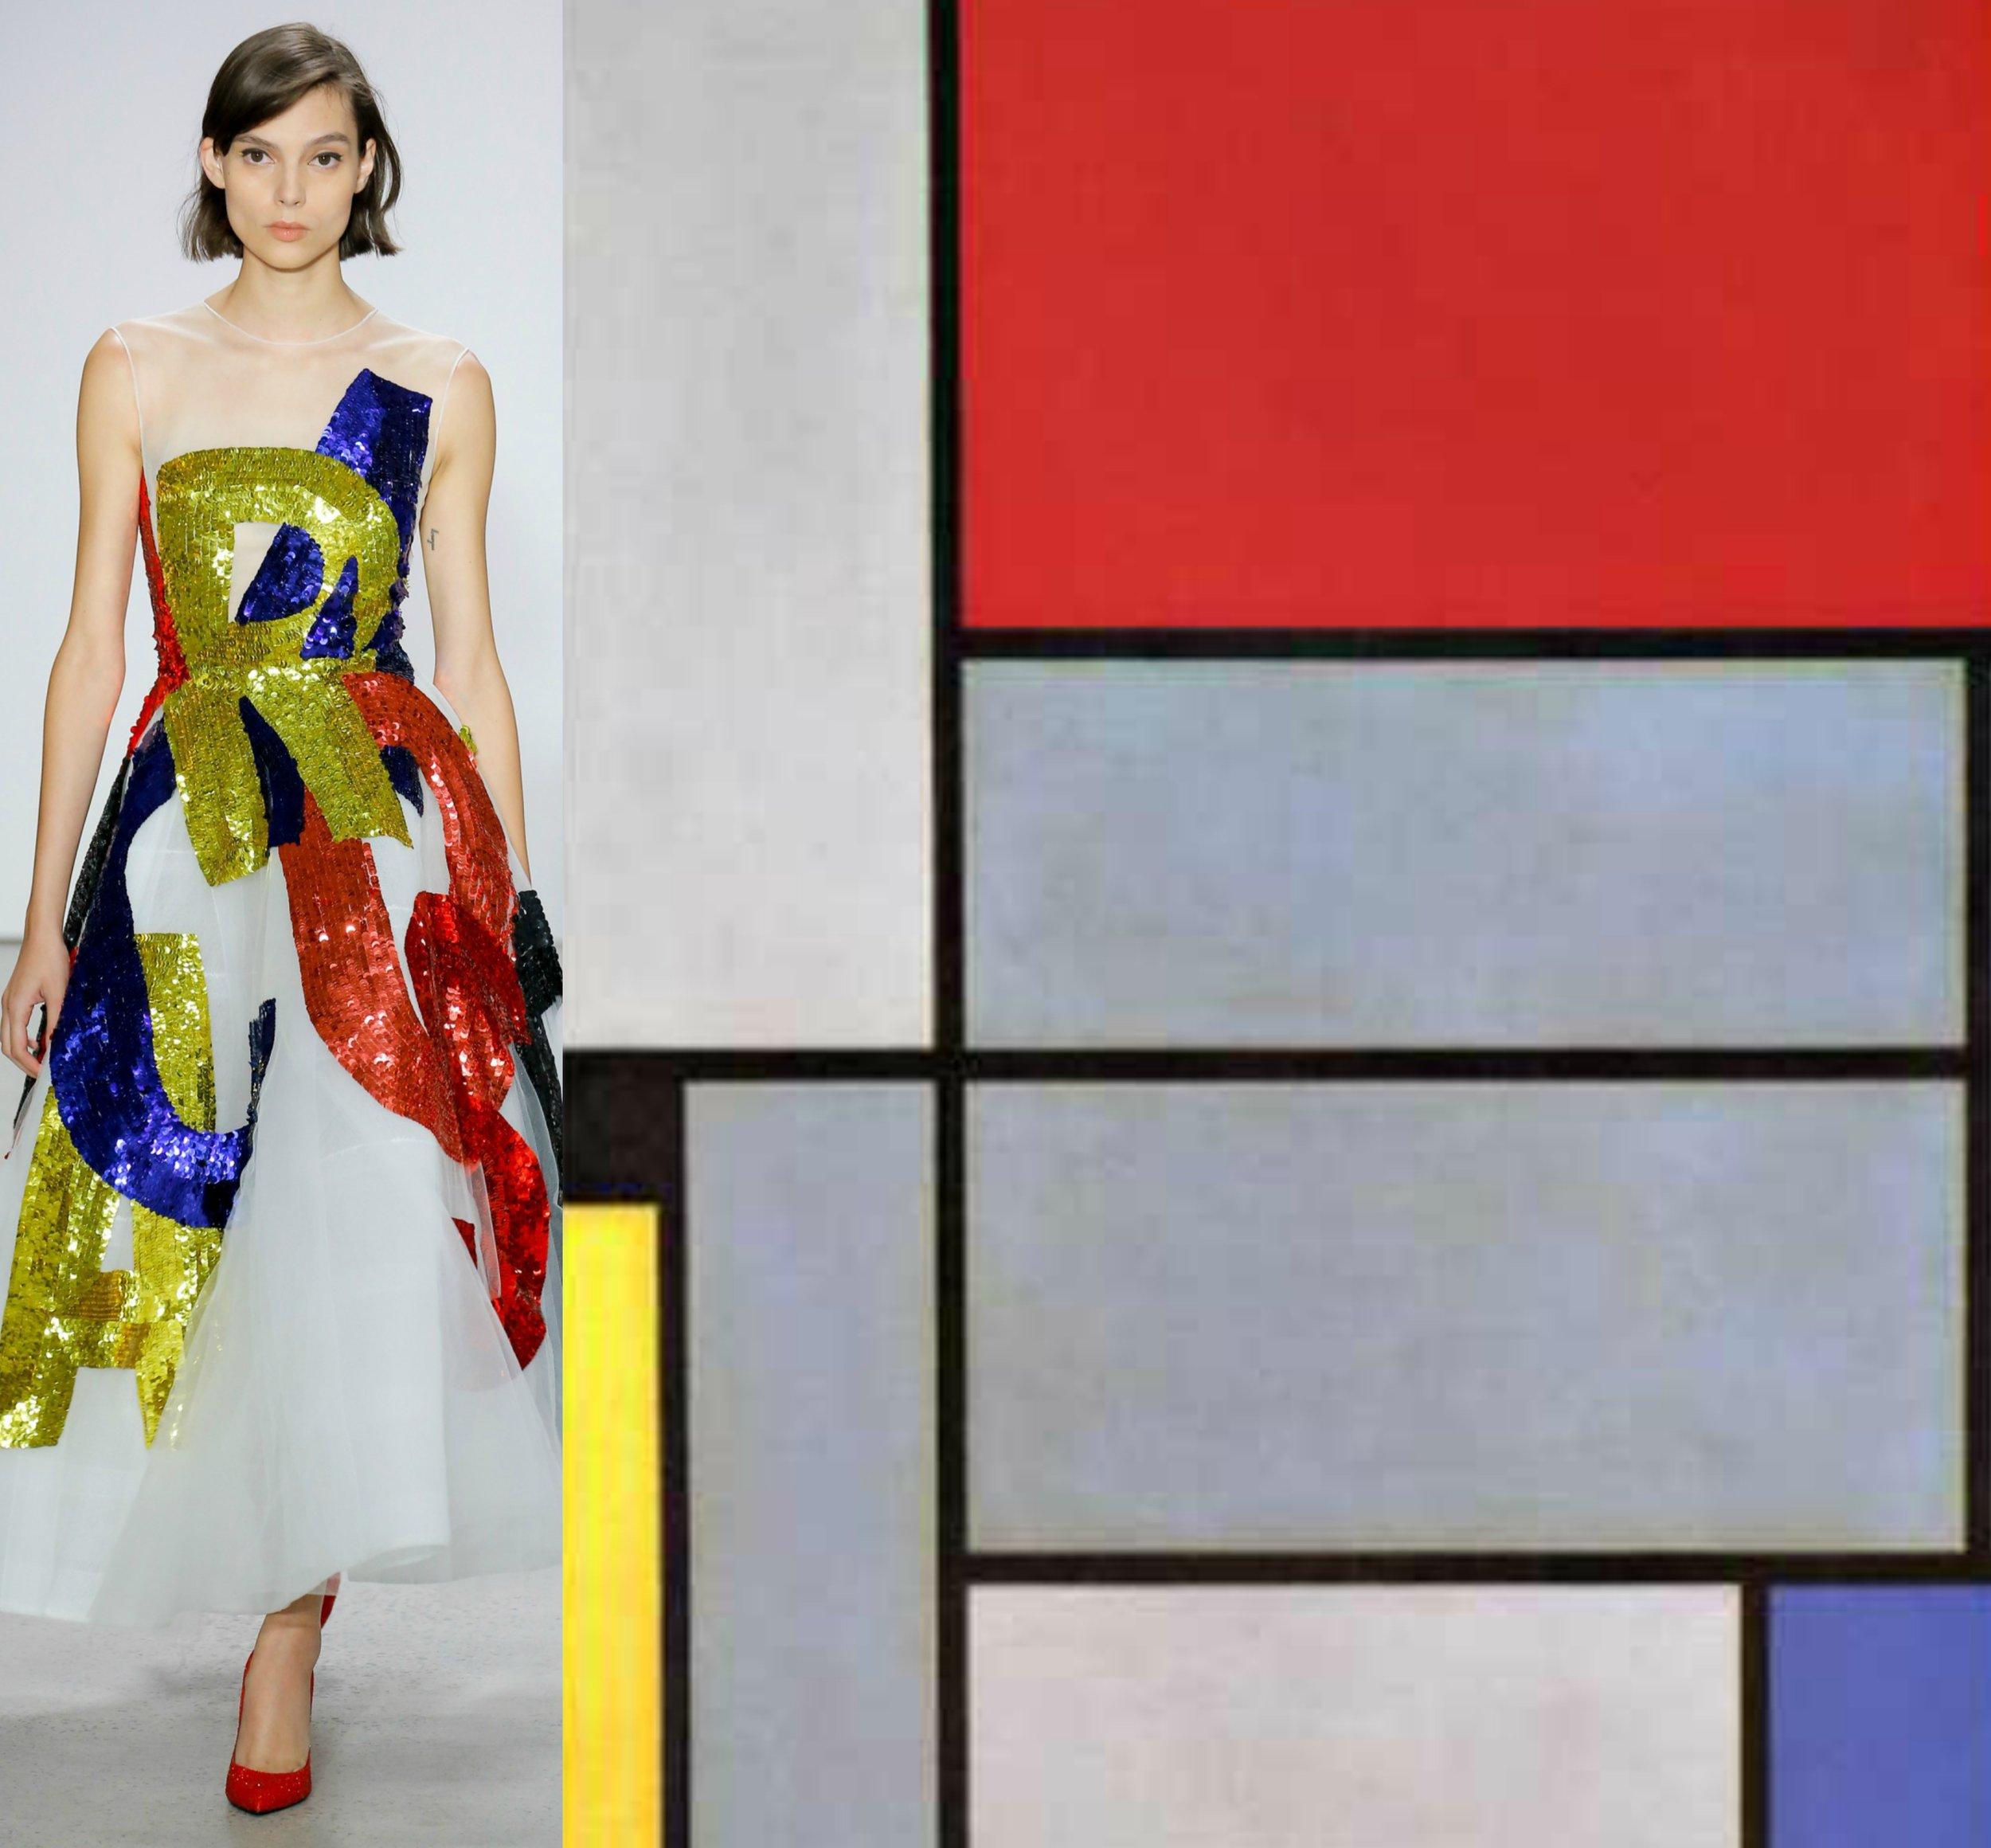 Oscar de la Renta - Piet Mondrian